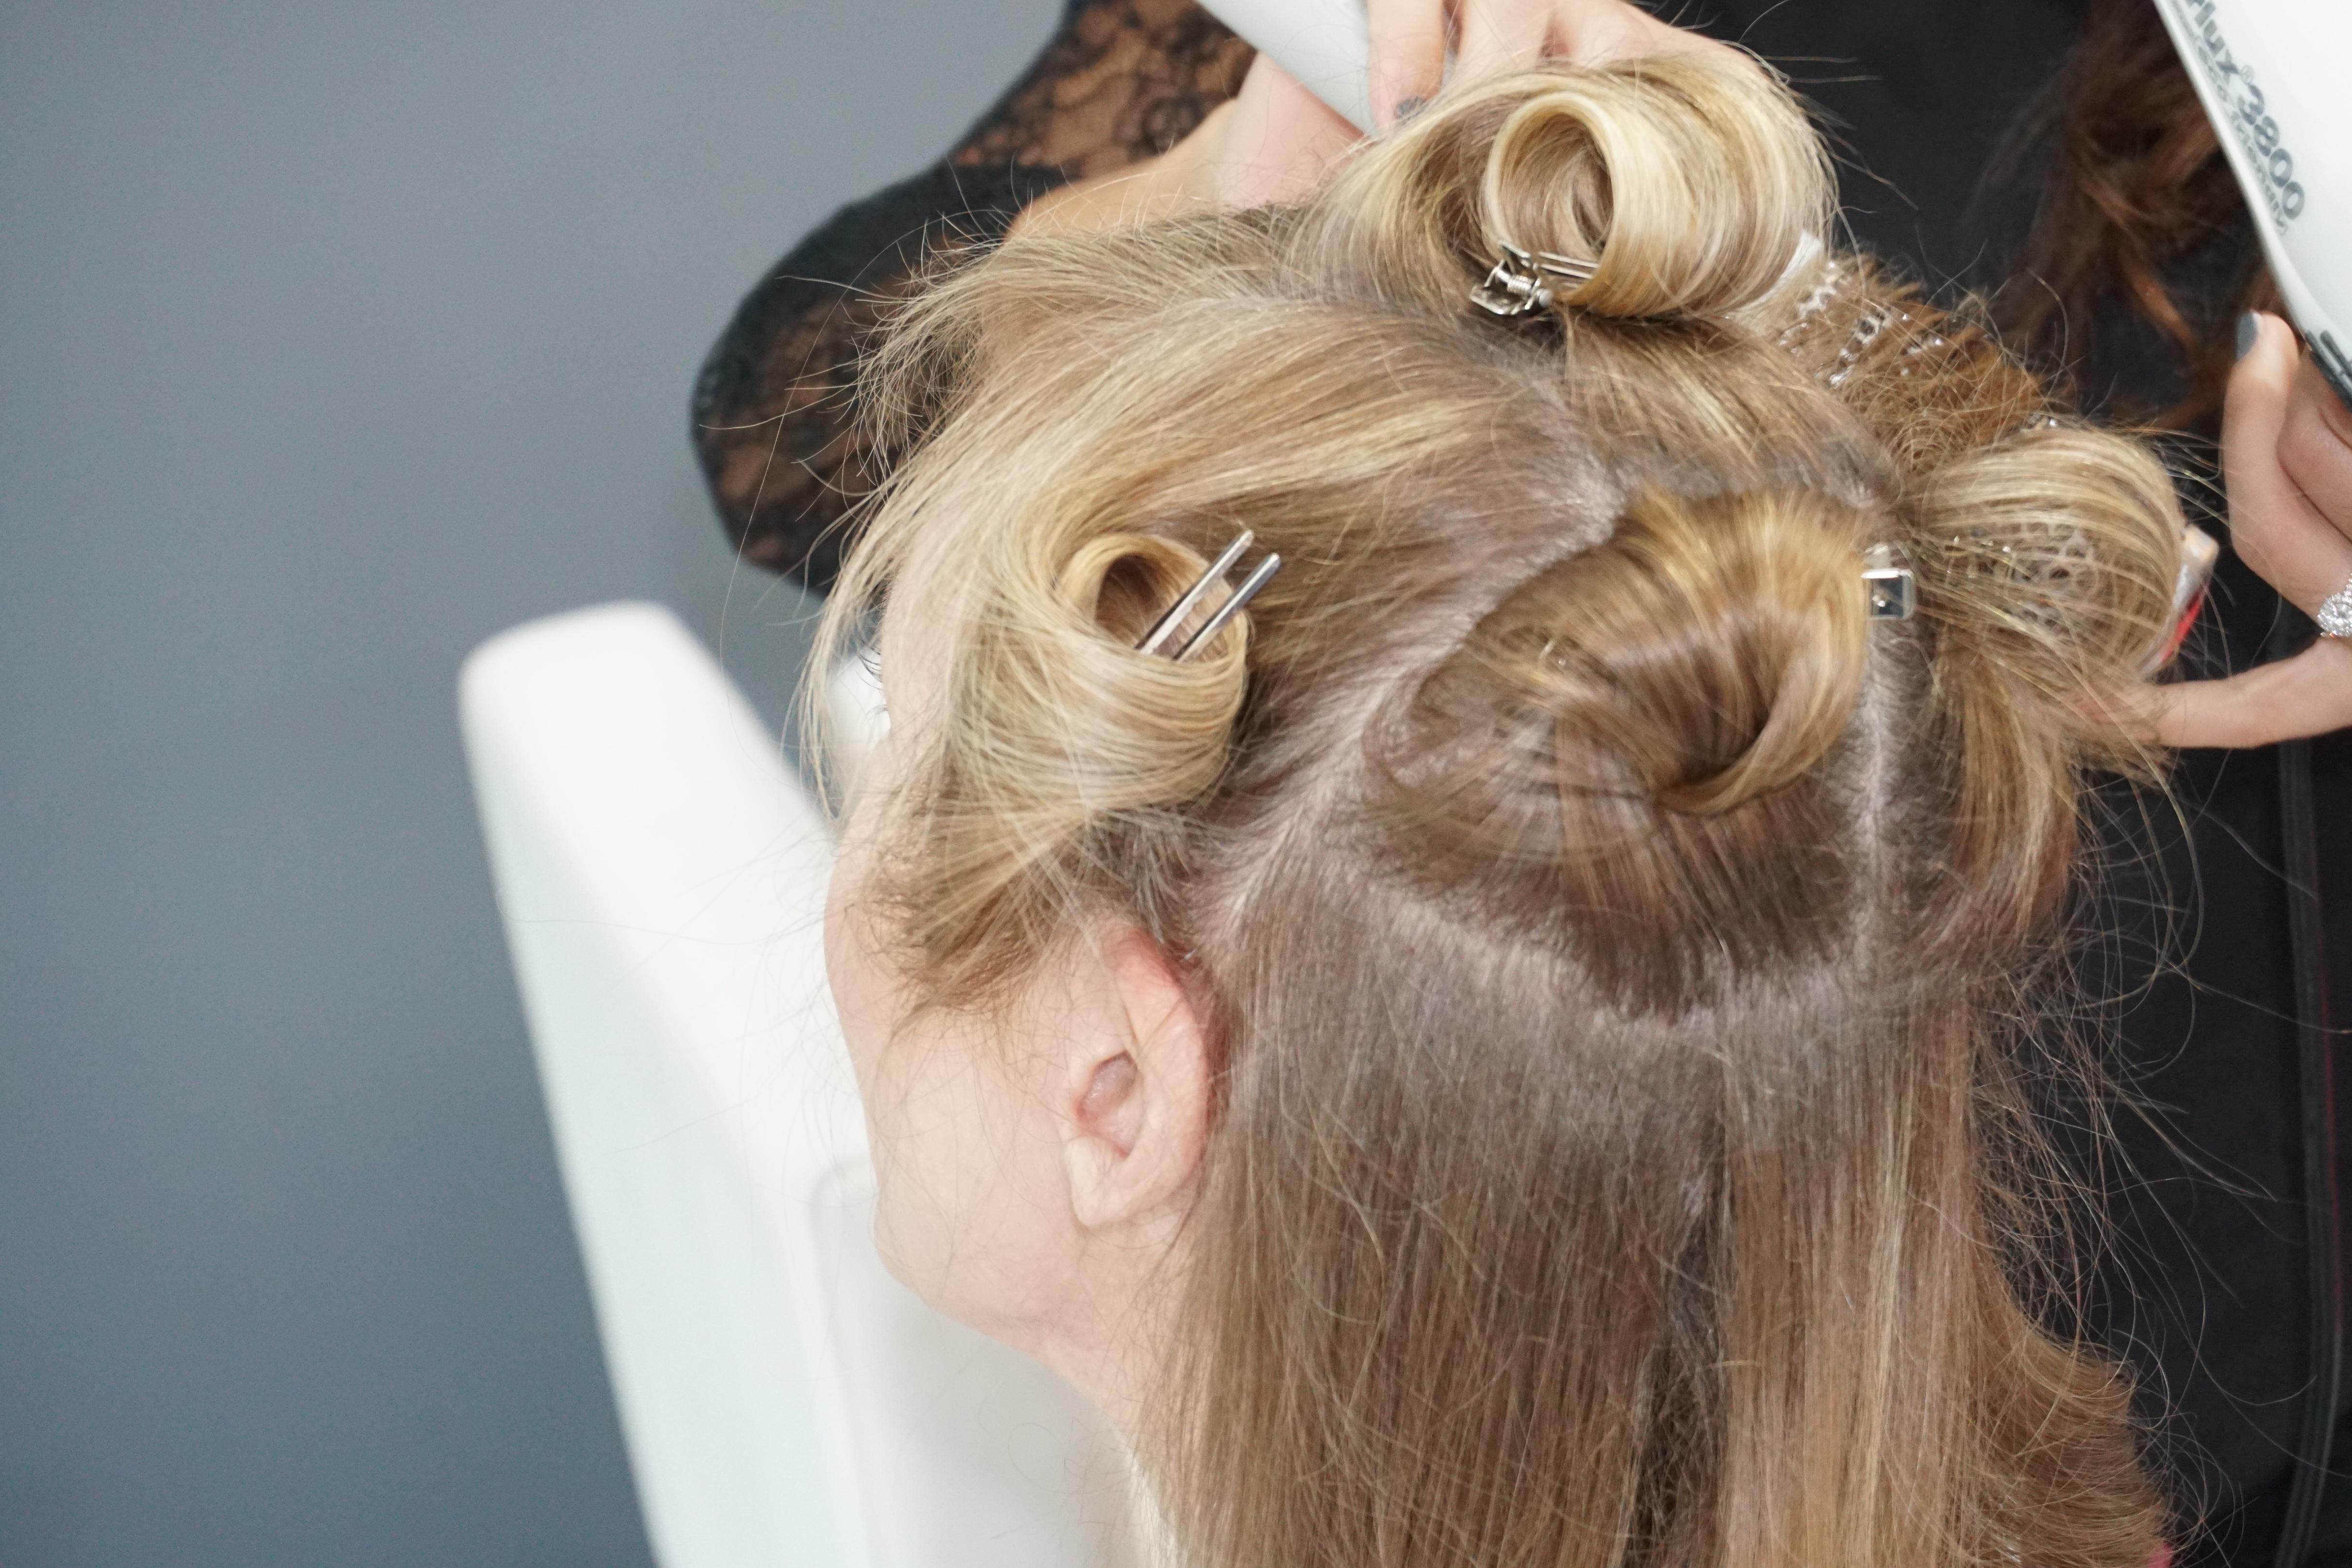 Woman's Hair in pincurls